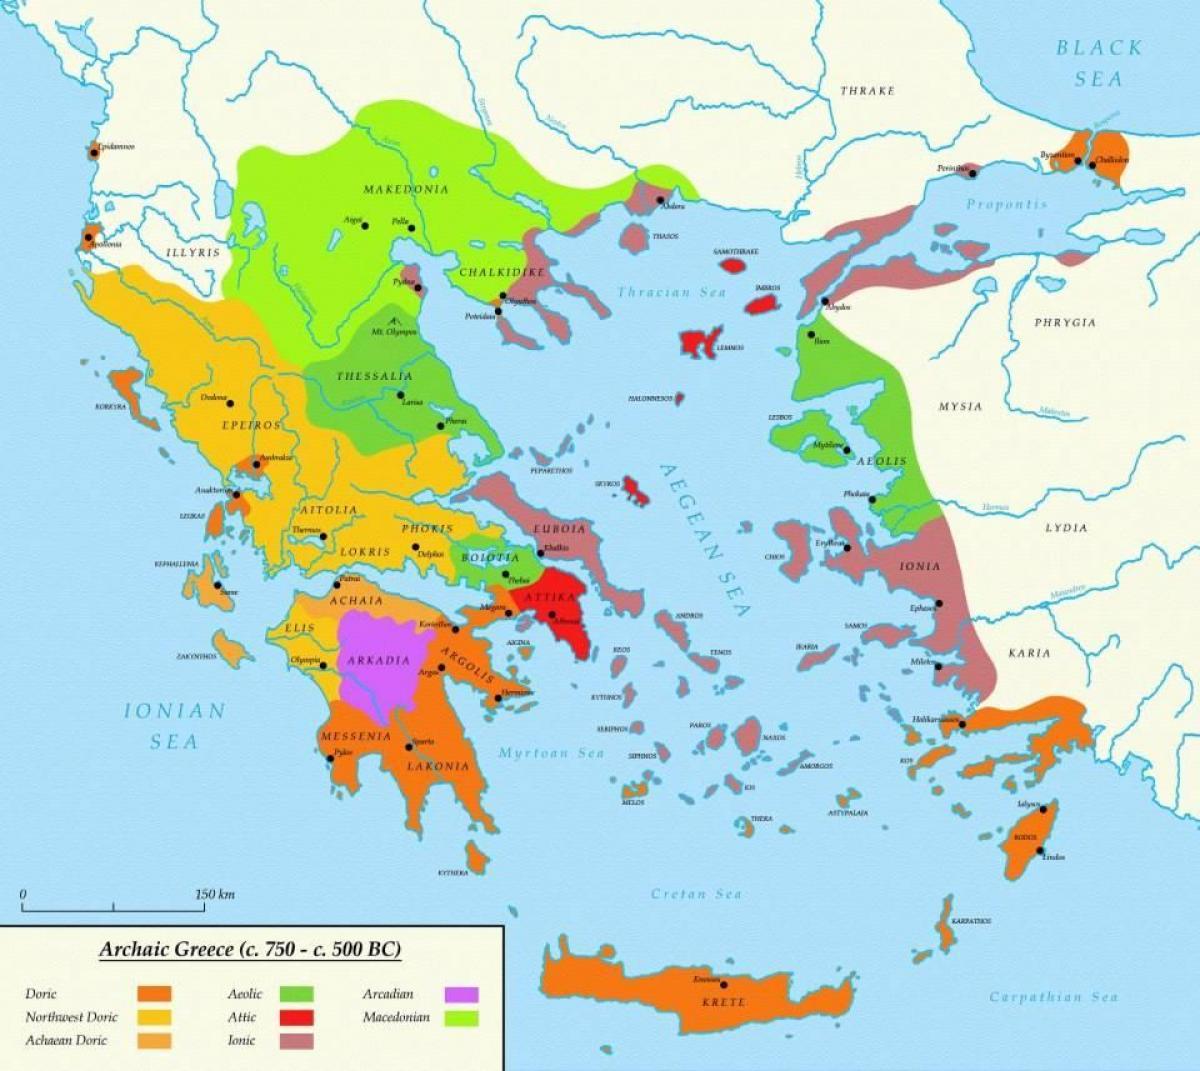 Atina V Drevna Grciya Karta Karta Na Atina I Sparta Drevna